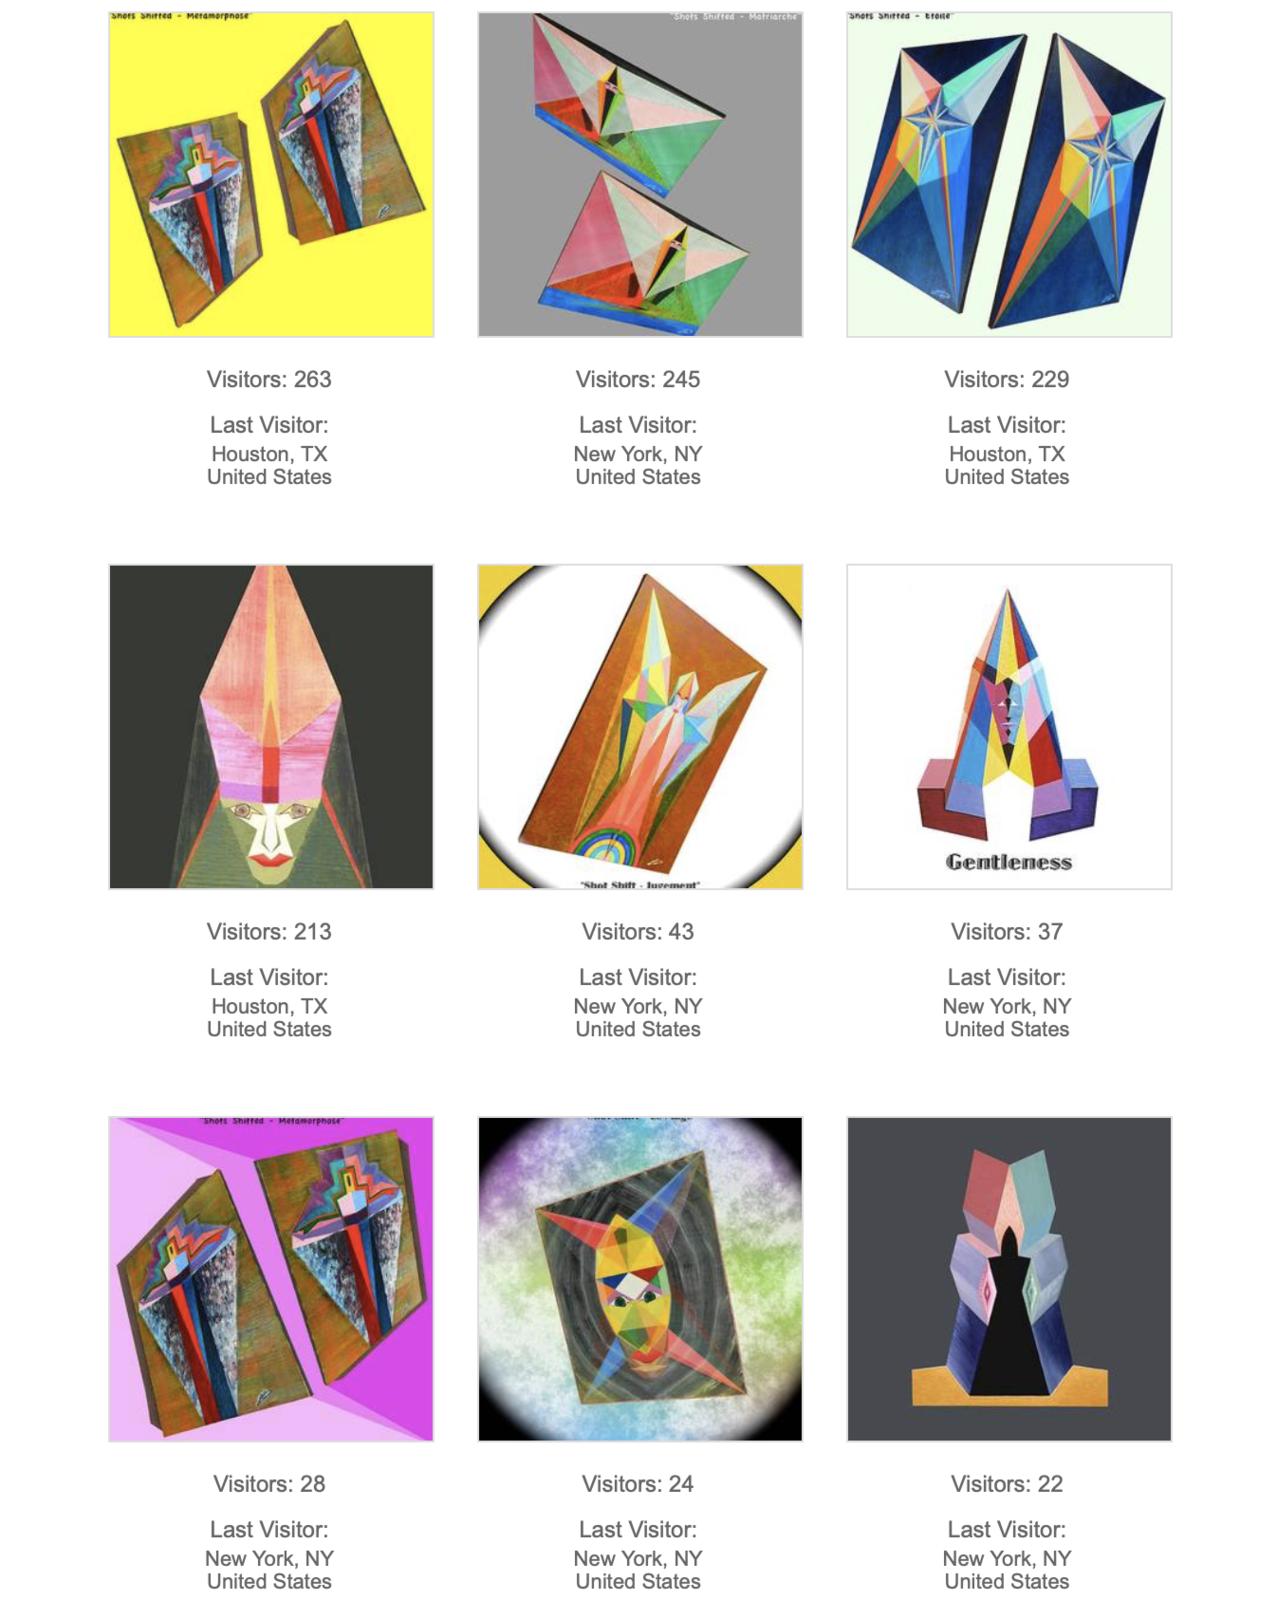 FINE ART AMERICA - Weekly Update for Michael Bellon 12/29